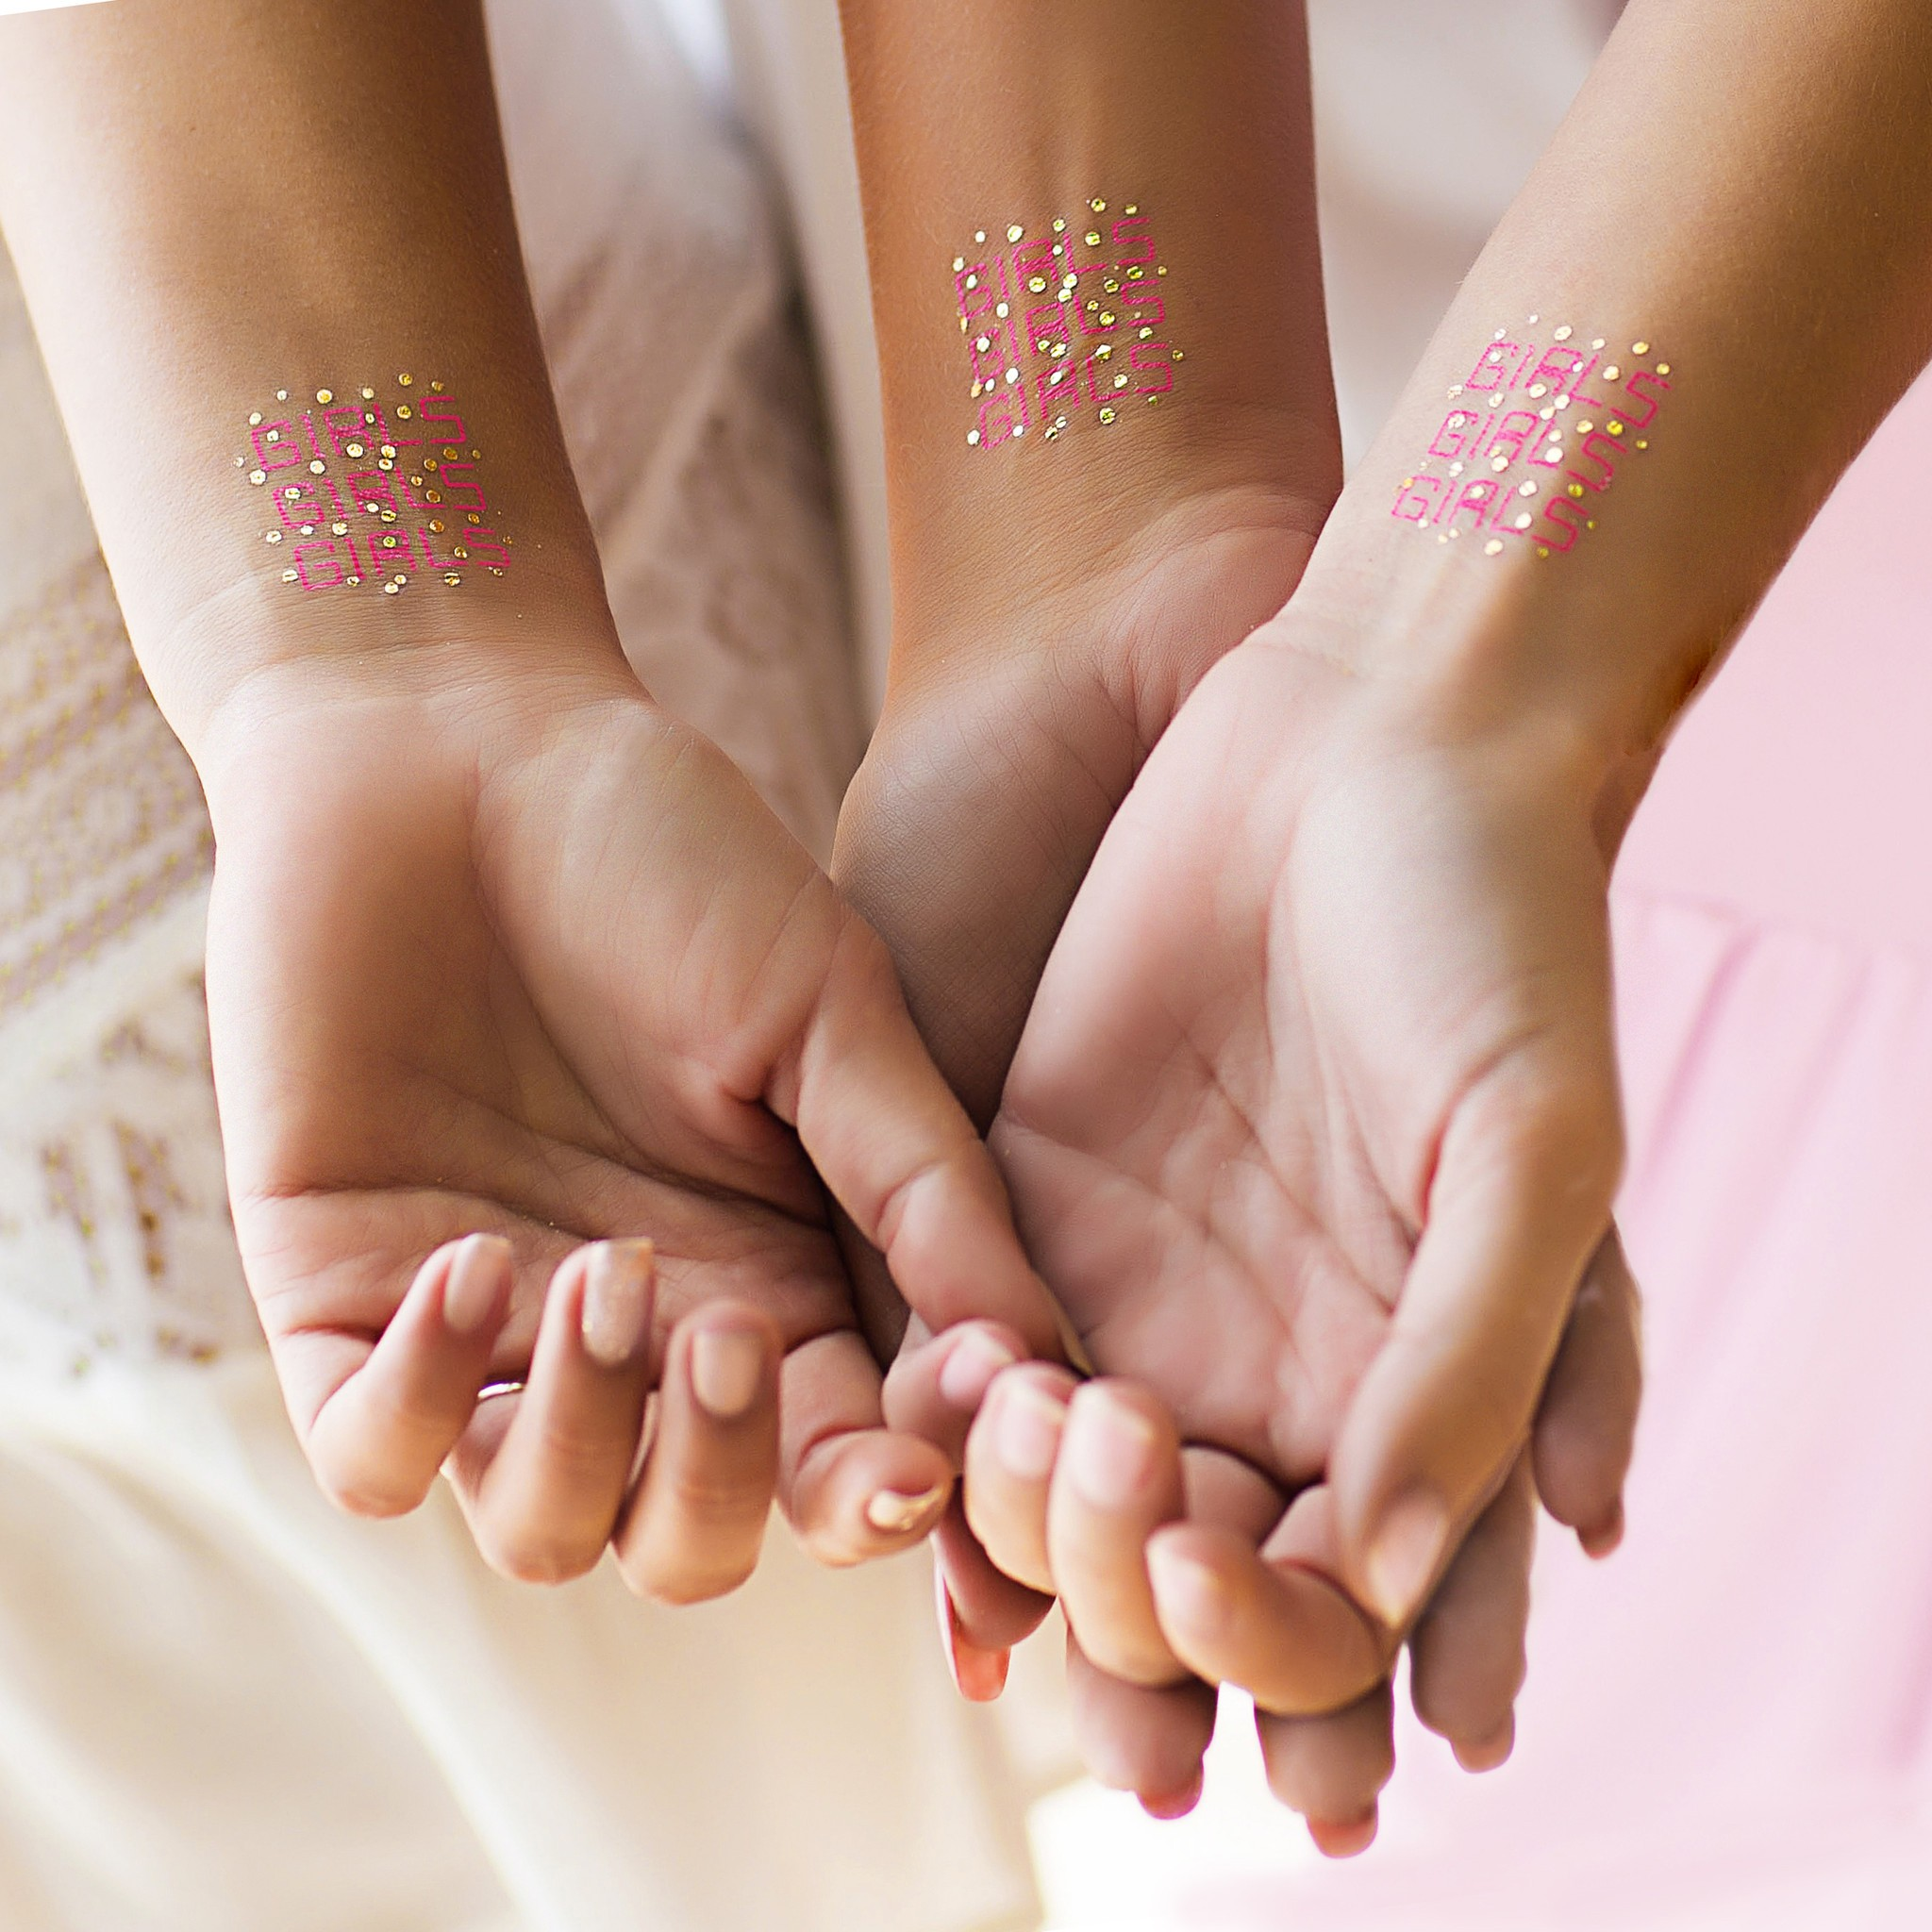 Tatouage éphémère Girls Girls Girls